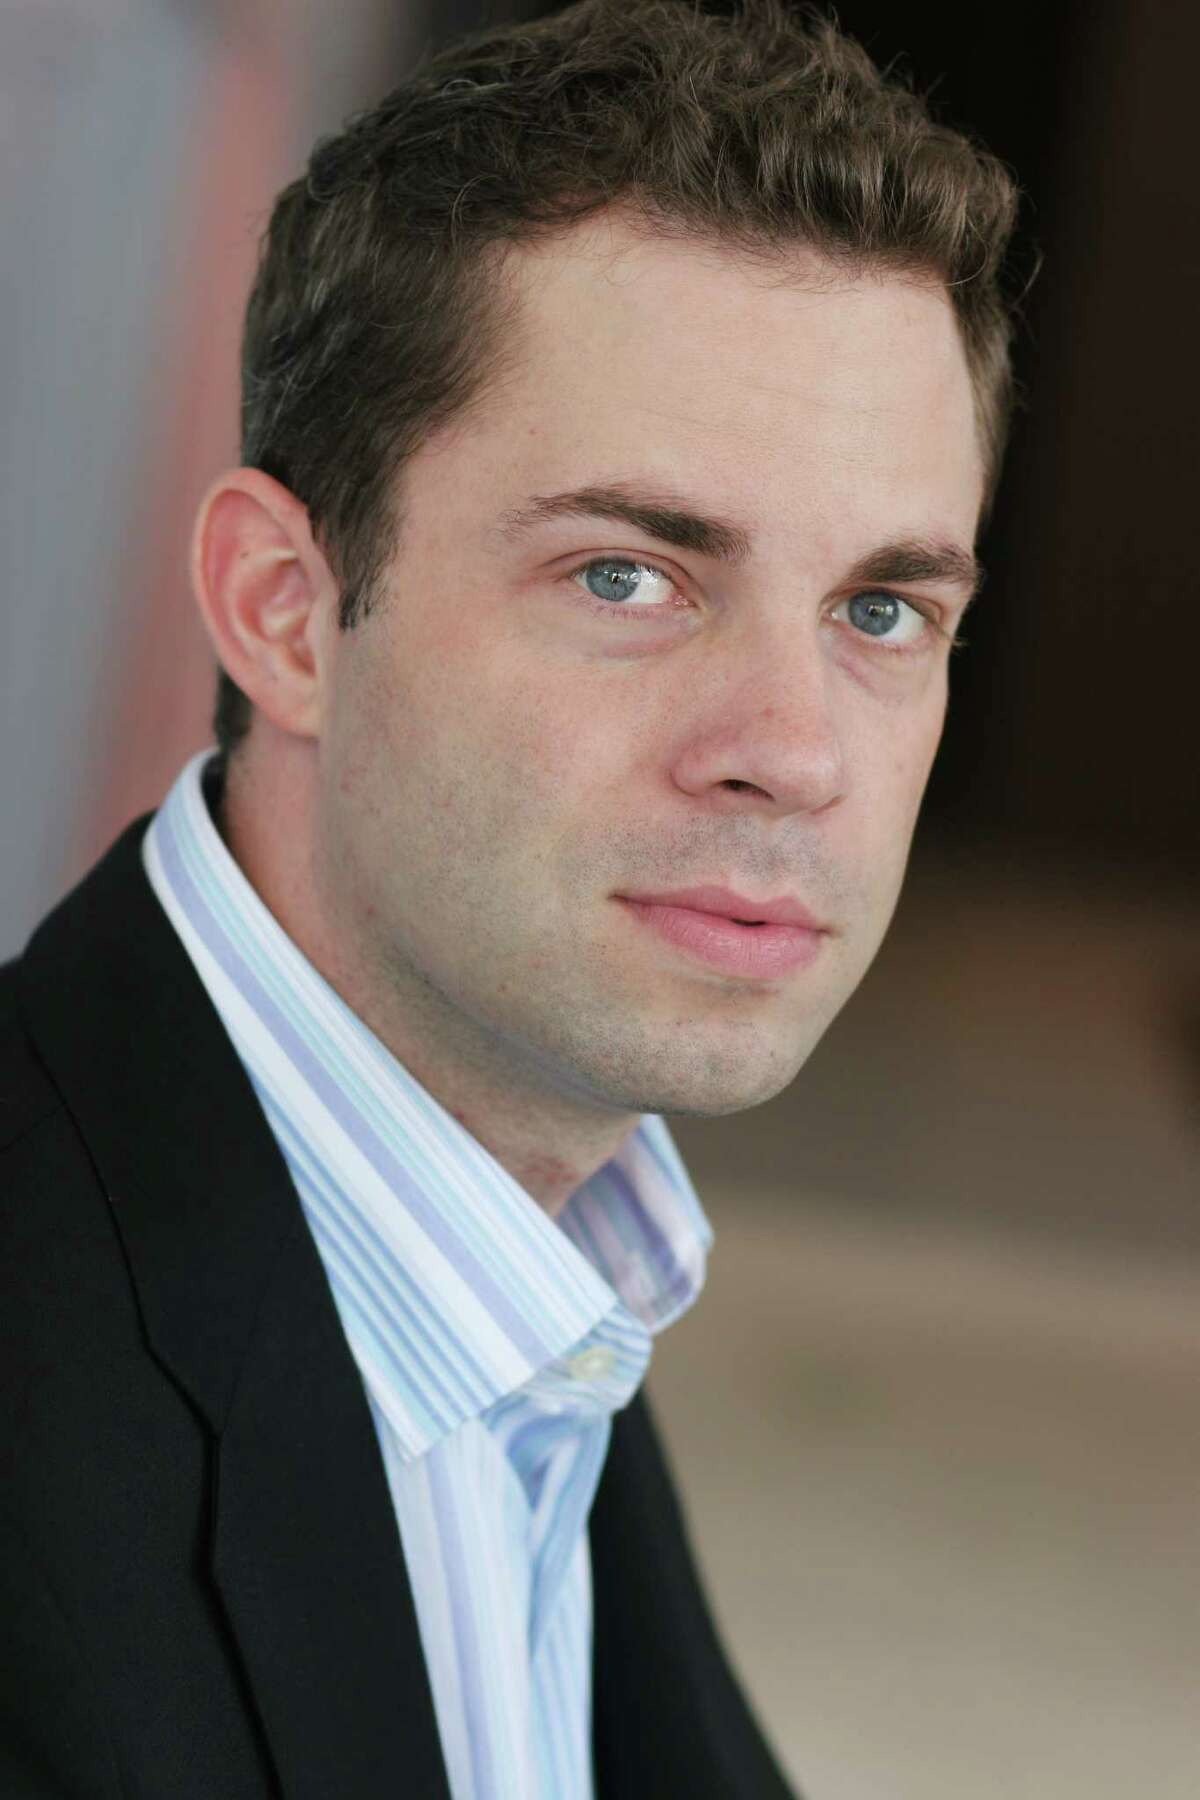 Chad Larabee